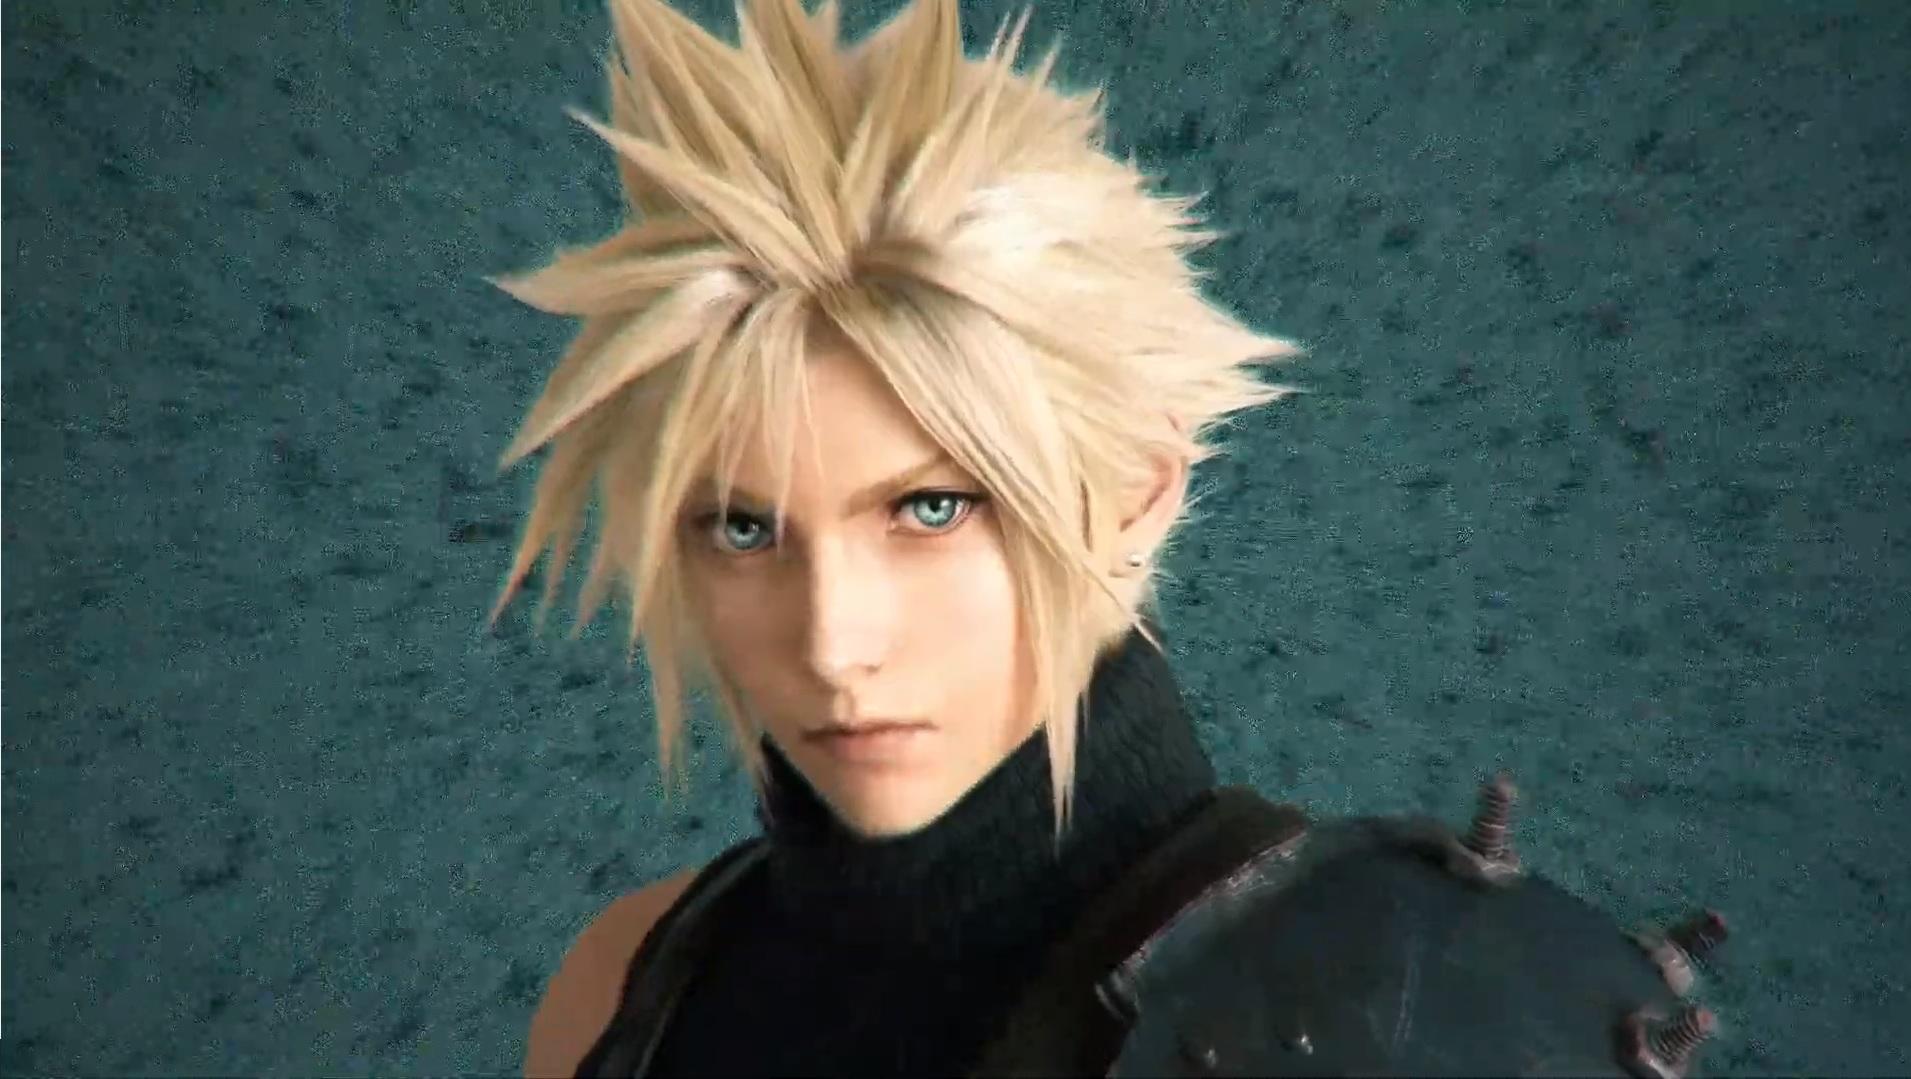 Japan gets a Final Fantasy VII Remake action-stealth escape room-style game screenshot